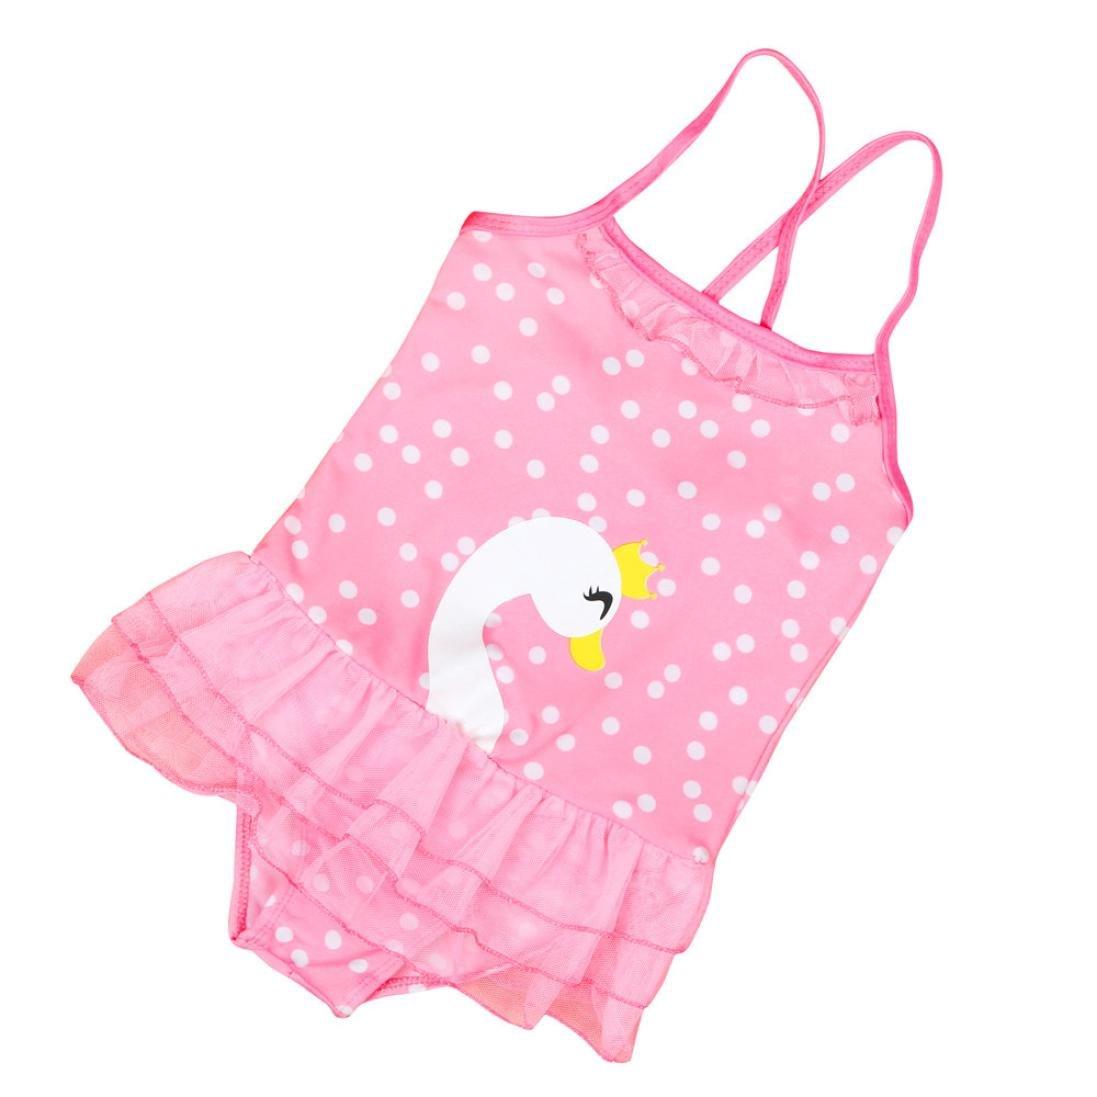 Wanshop Little Girl Swimwear, Baby Girls Cute One Piece Swimsuit Swan Print Swimwear Swimming Costume 1-3 Years Old